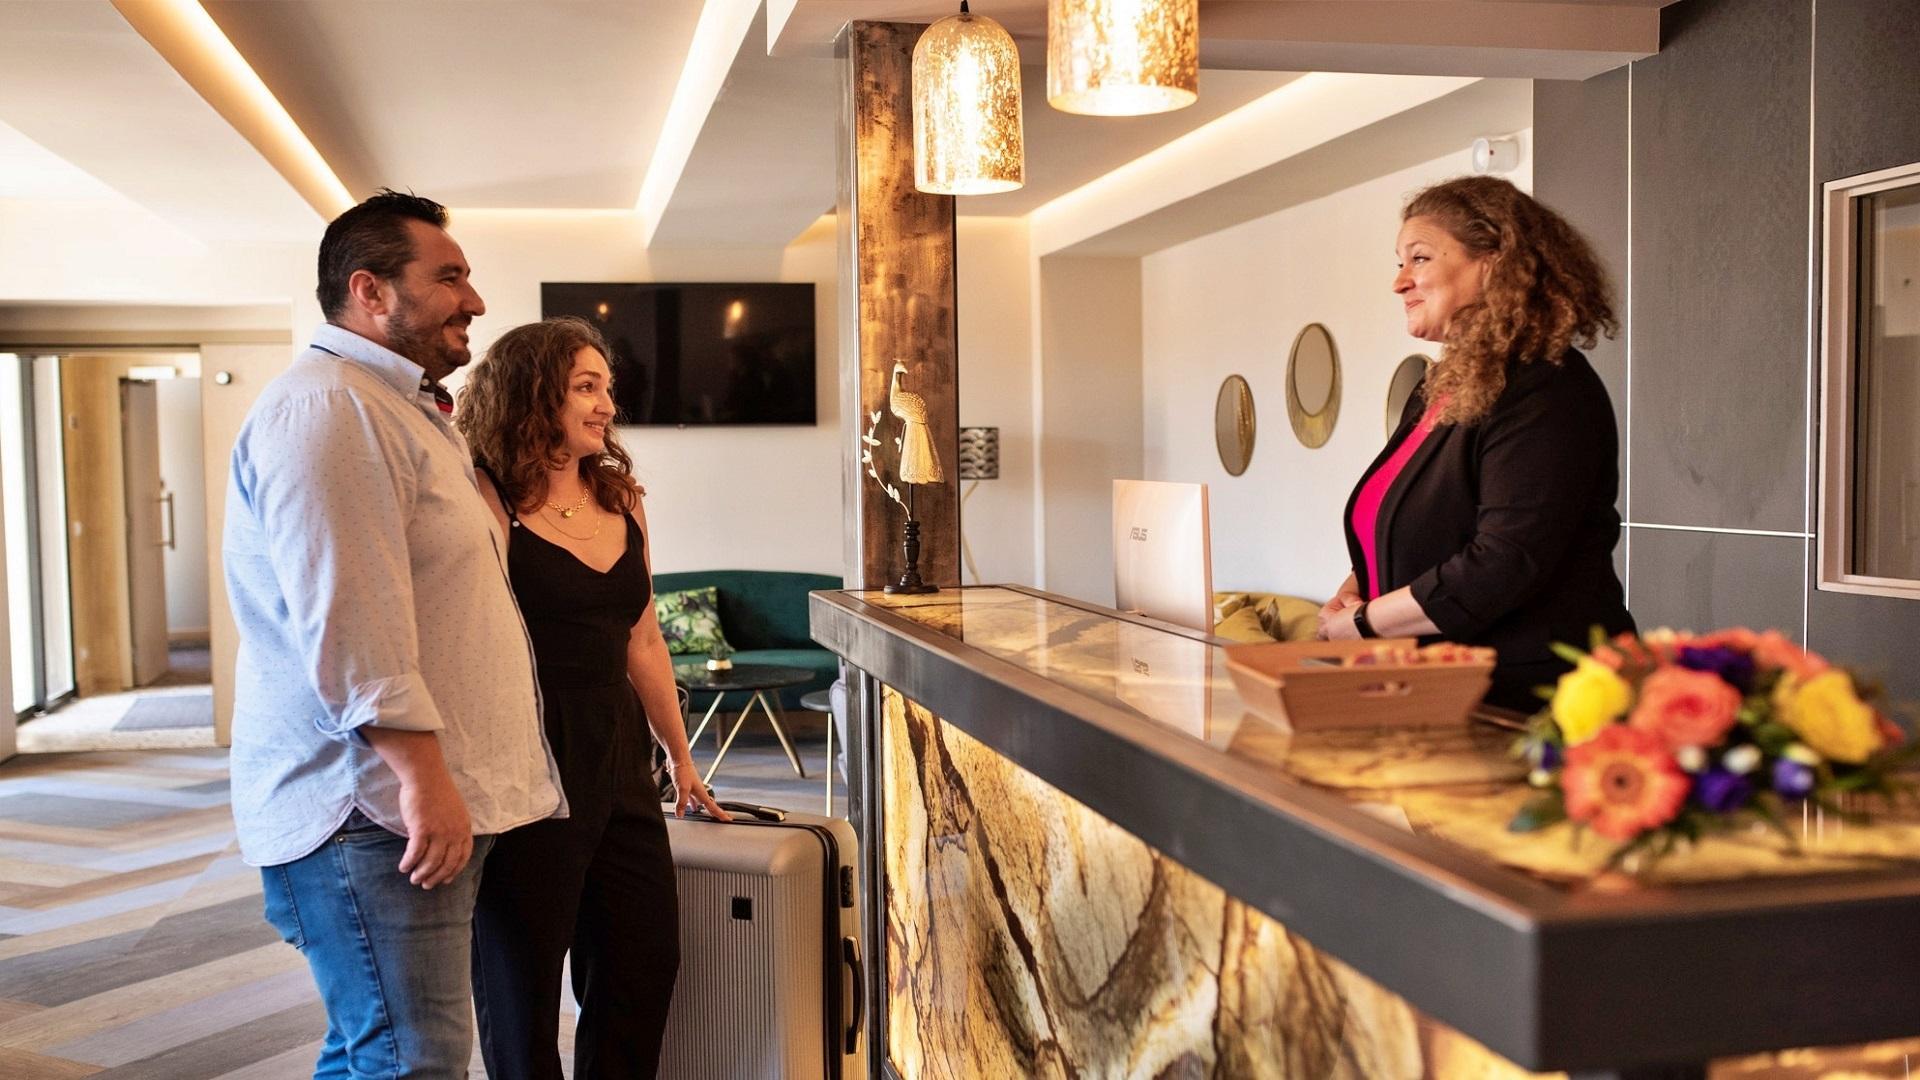 Hotel 1770-avignon-provence-sud-france-lobby-seminaires-de-caractere